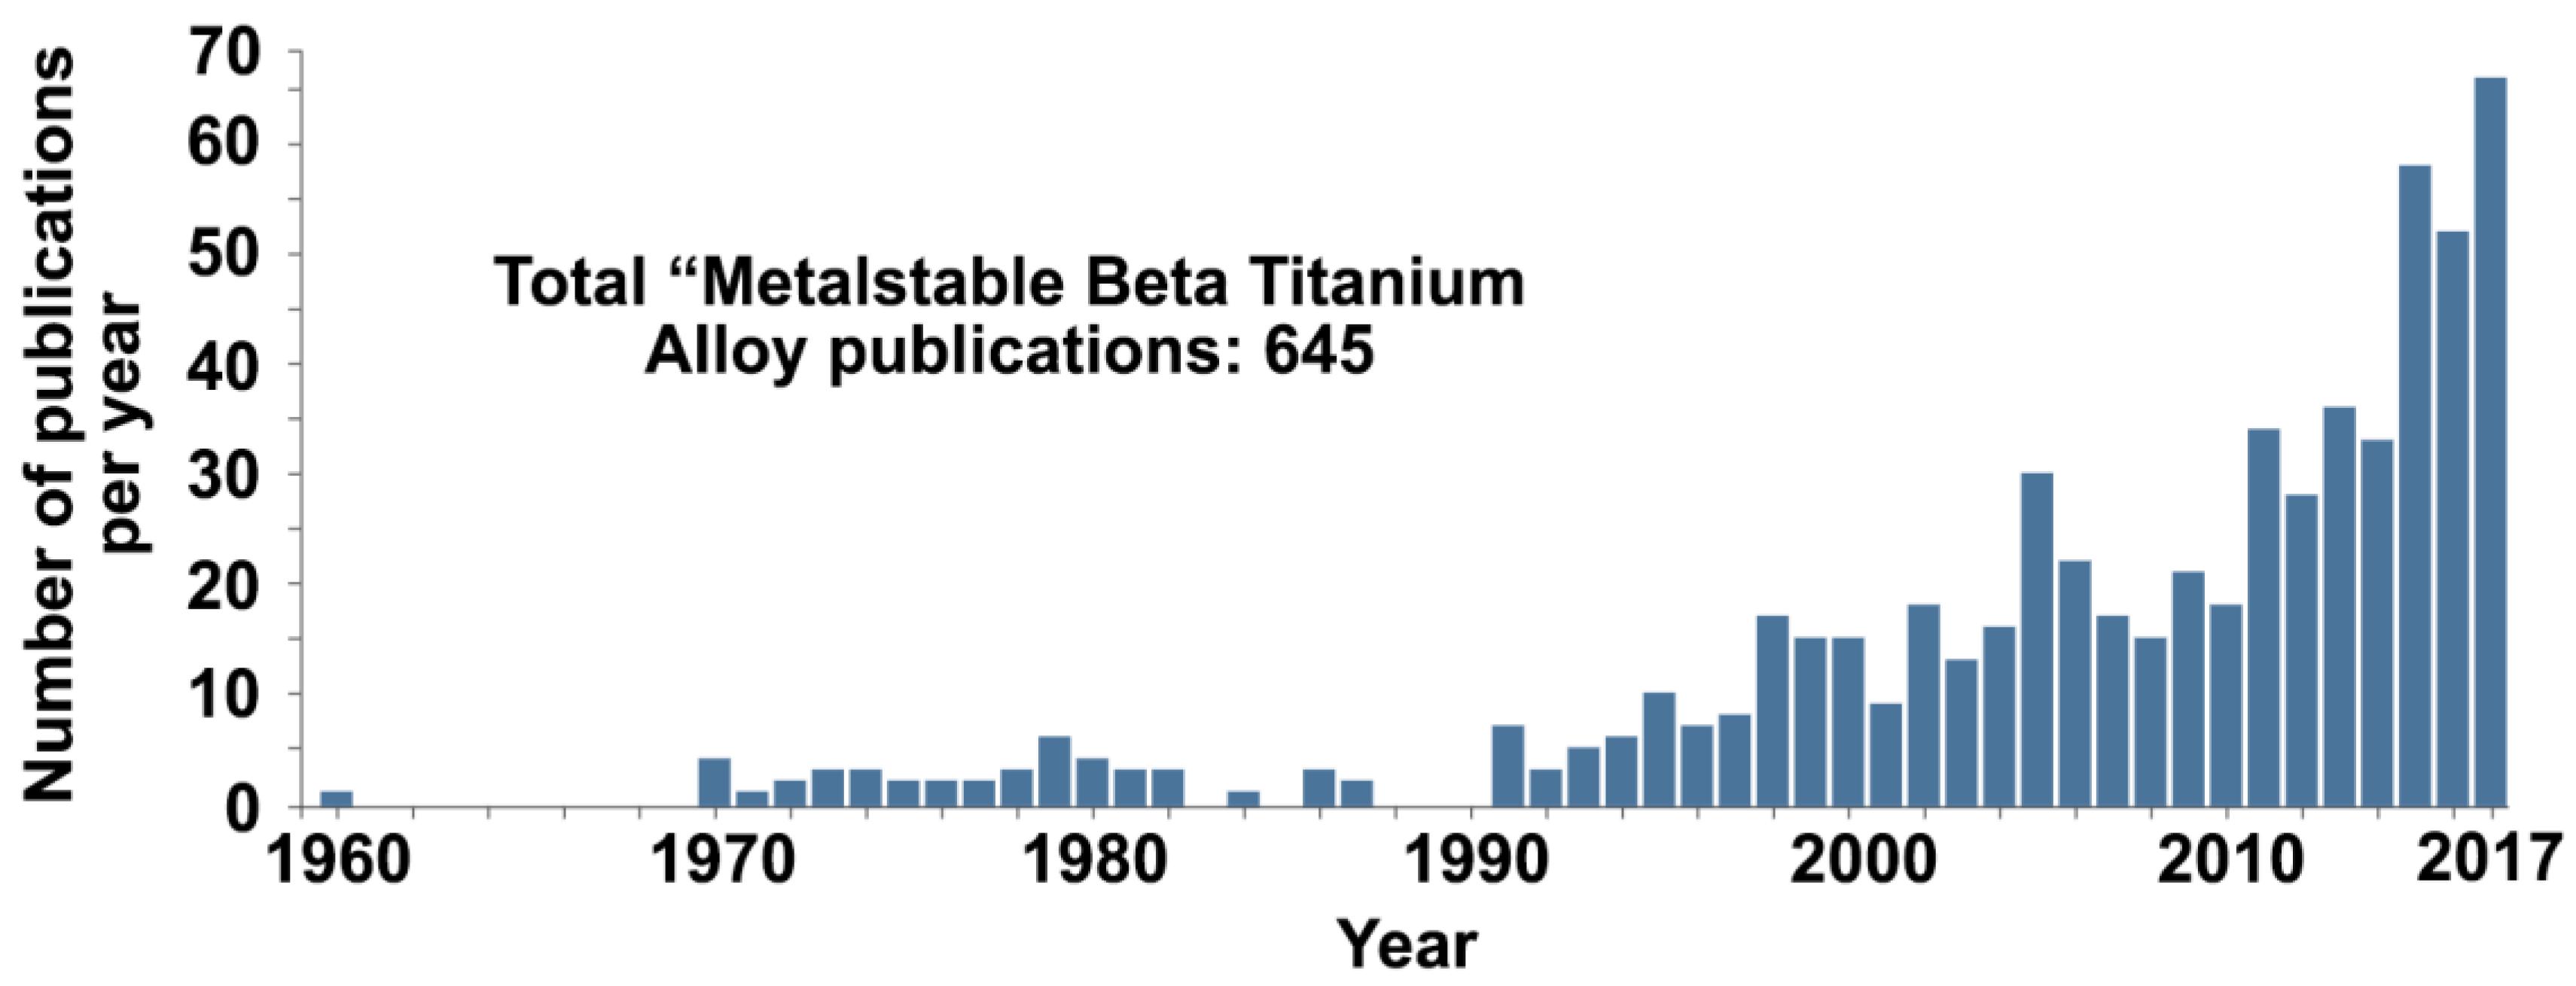 Metals Free Full Text A Review Of Metastable Beta Titanium 2014 Ninja 300 Engine Diagram 08 00506 G019